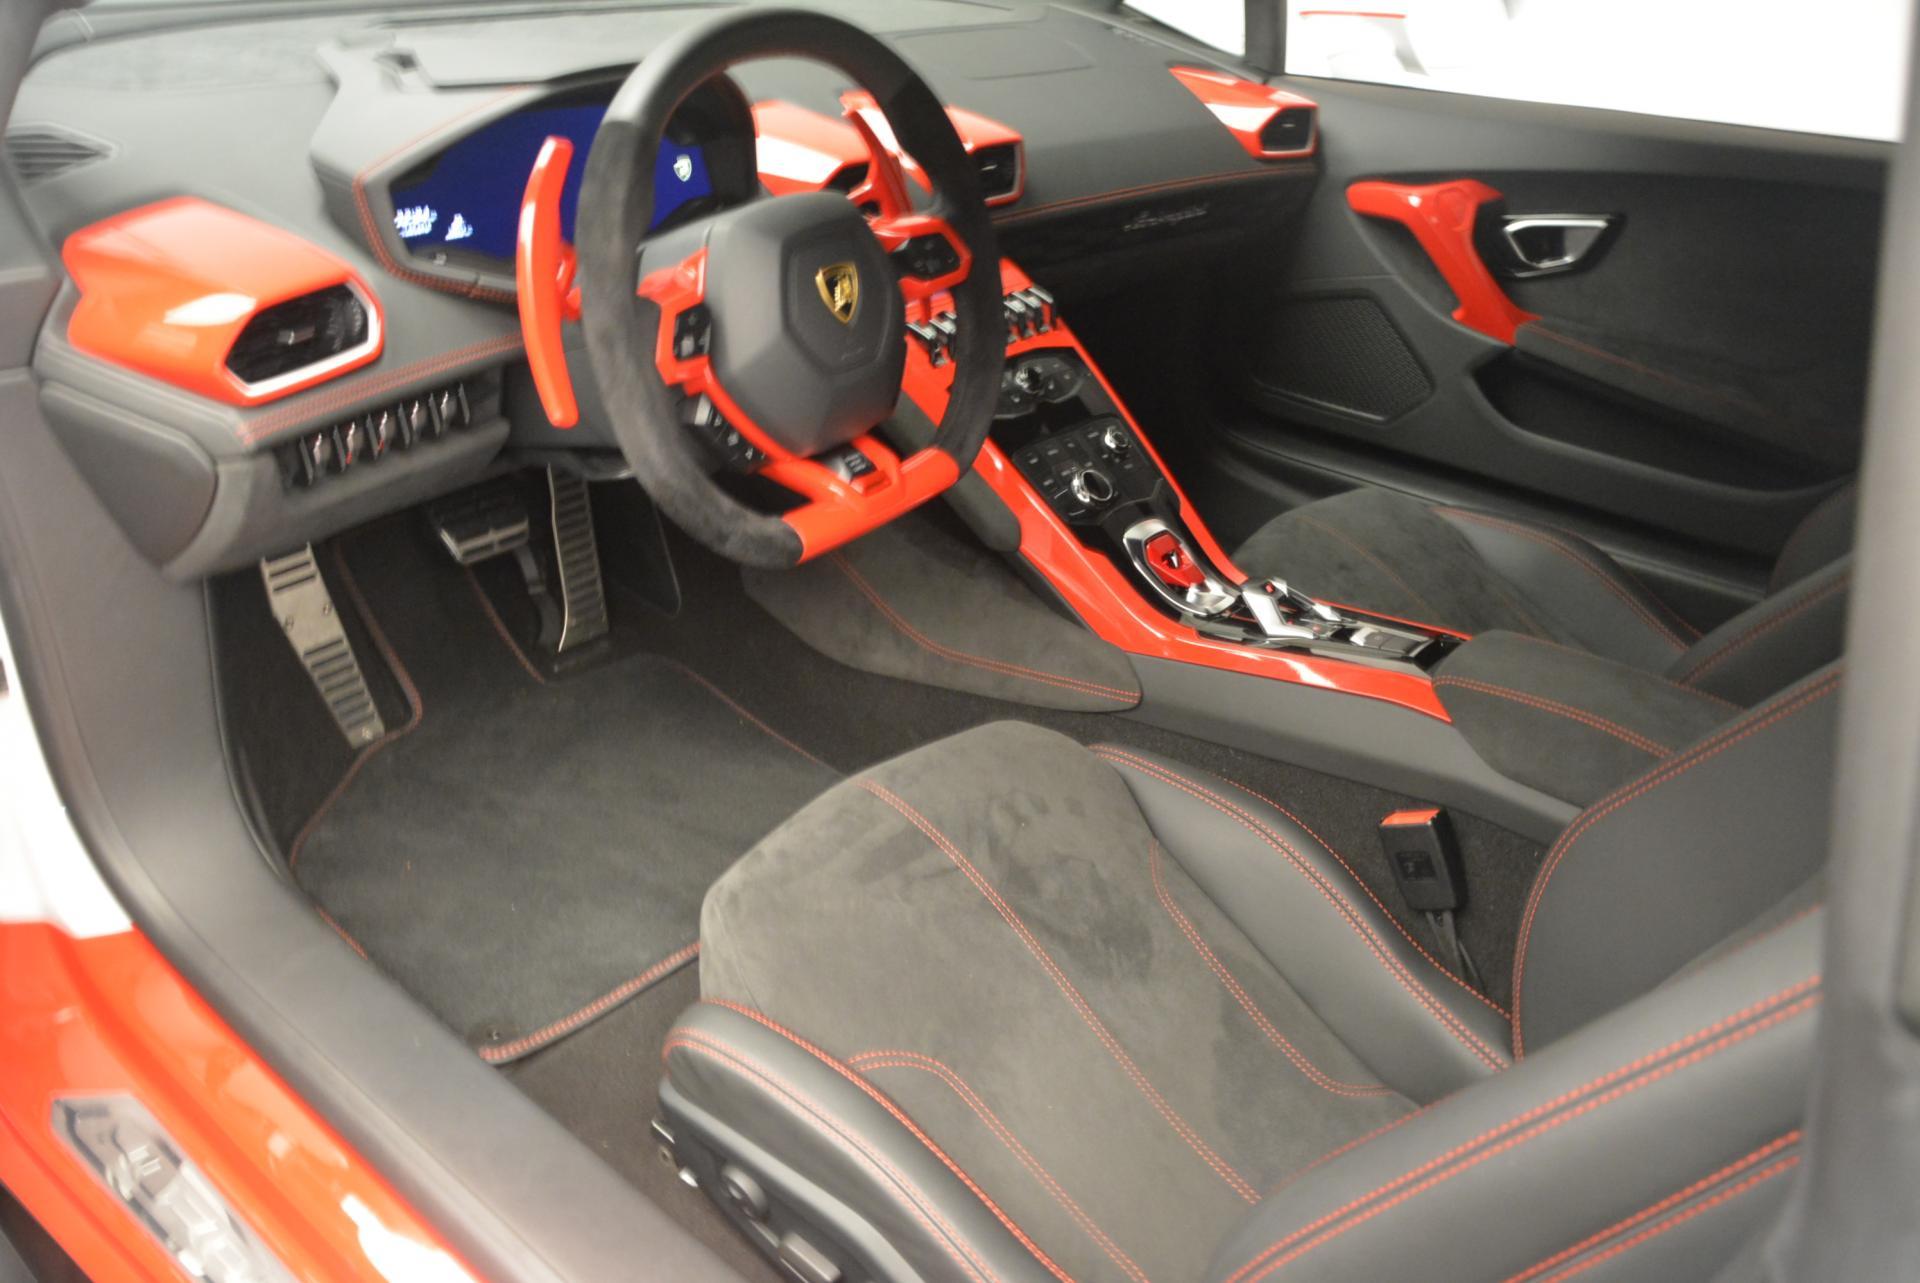 Used 2015 Lamborghini Huracan LP610-4 For Sale In Greenwich, CT. Alfa Romeo of Greenwich, F1707A 114_p14